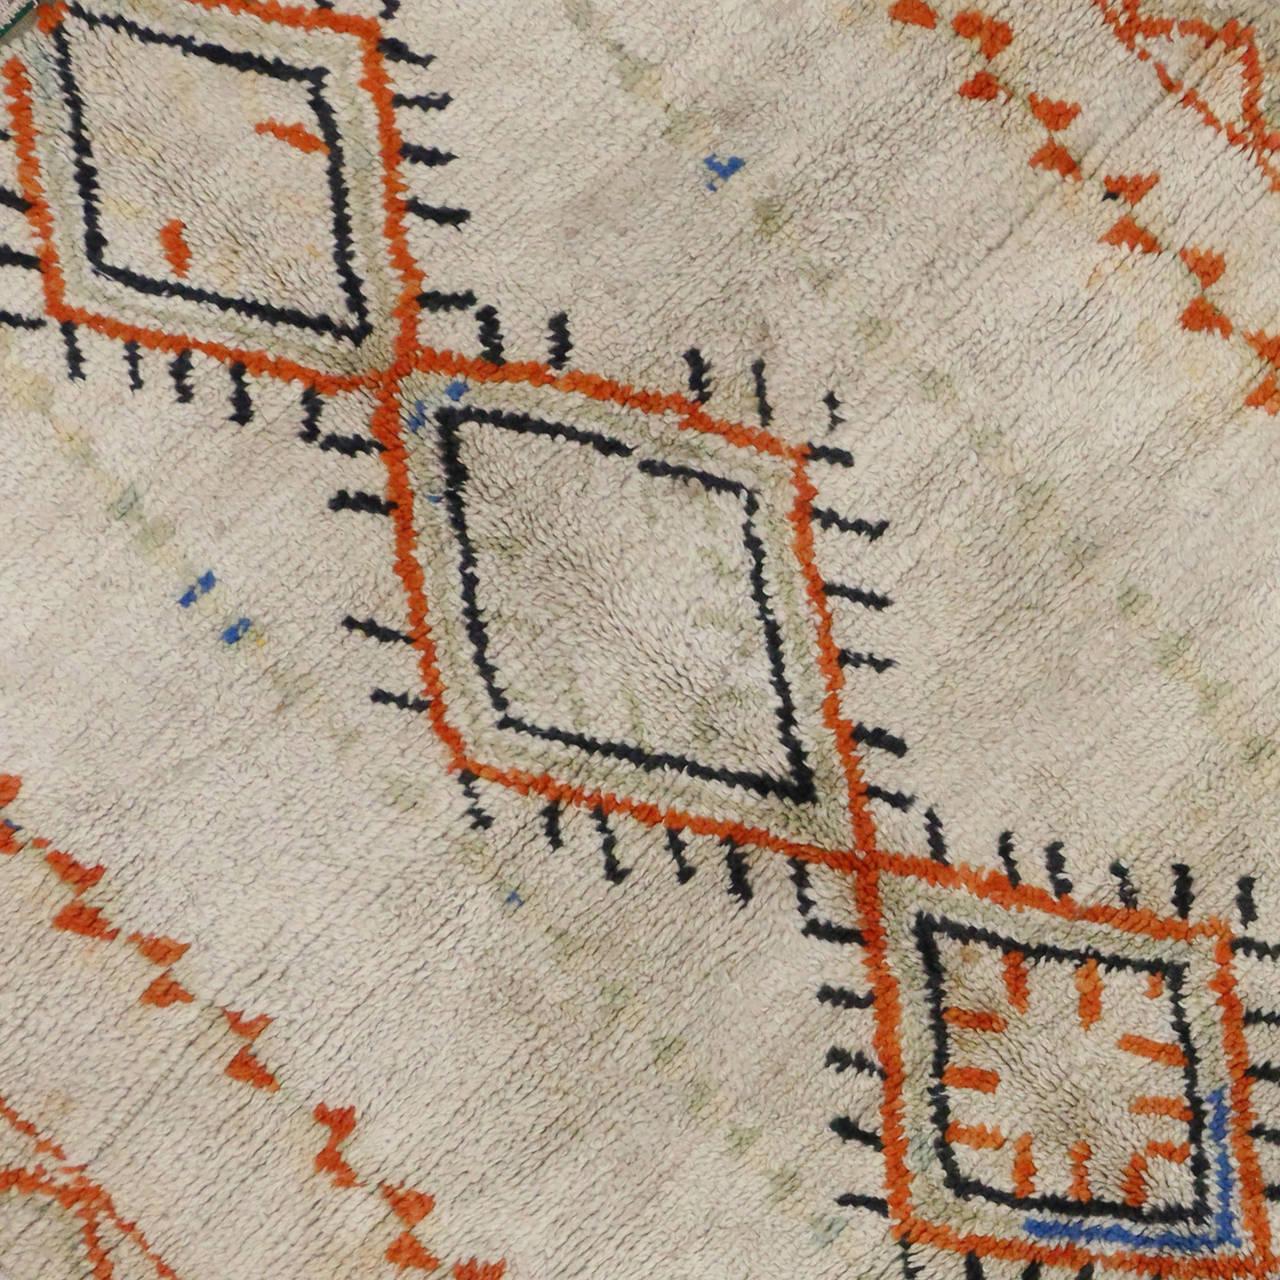 Hand-Knotted Vintage Berber Moroccan Rug, 04'06